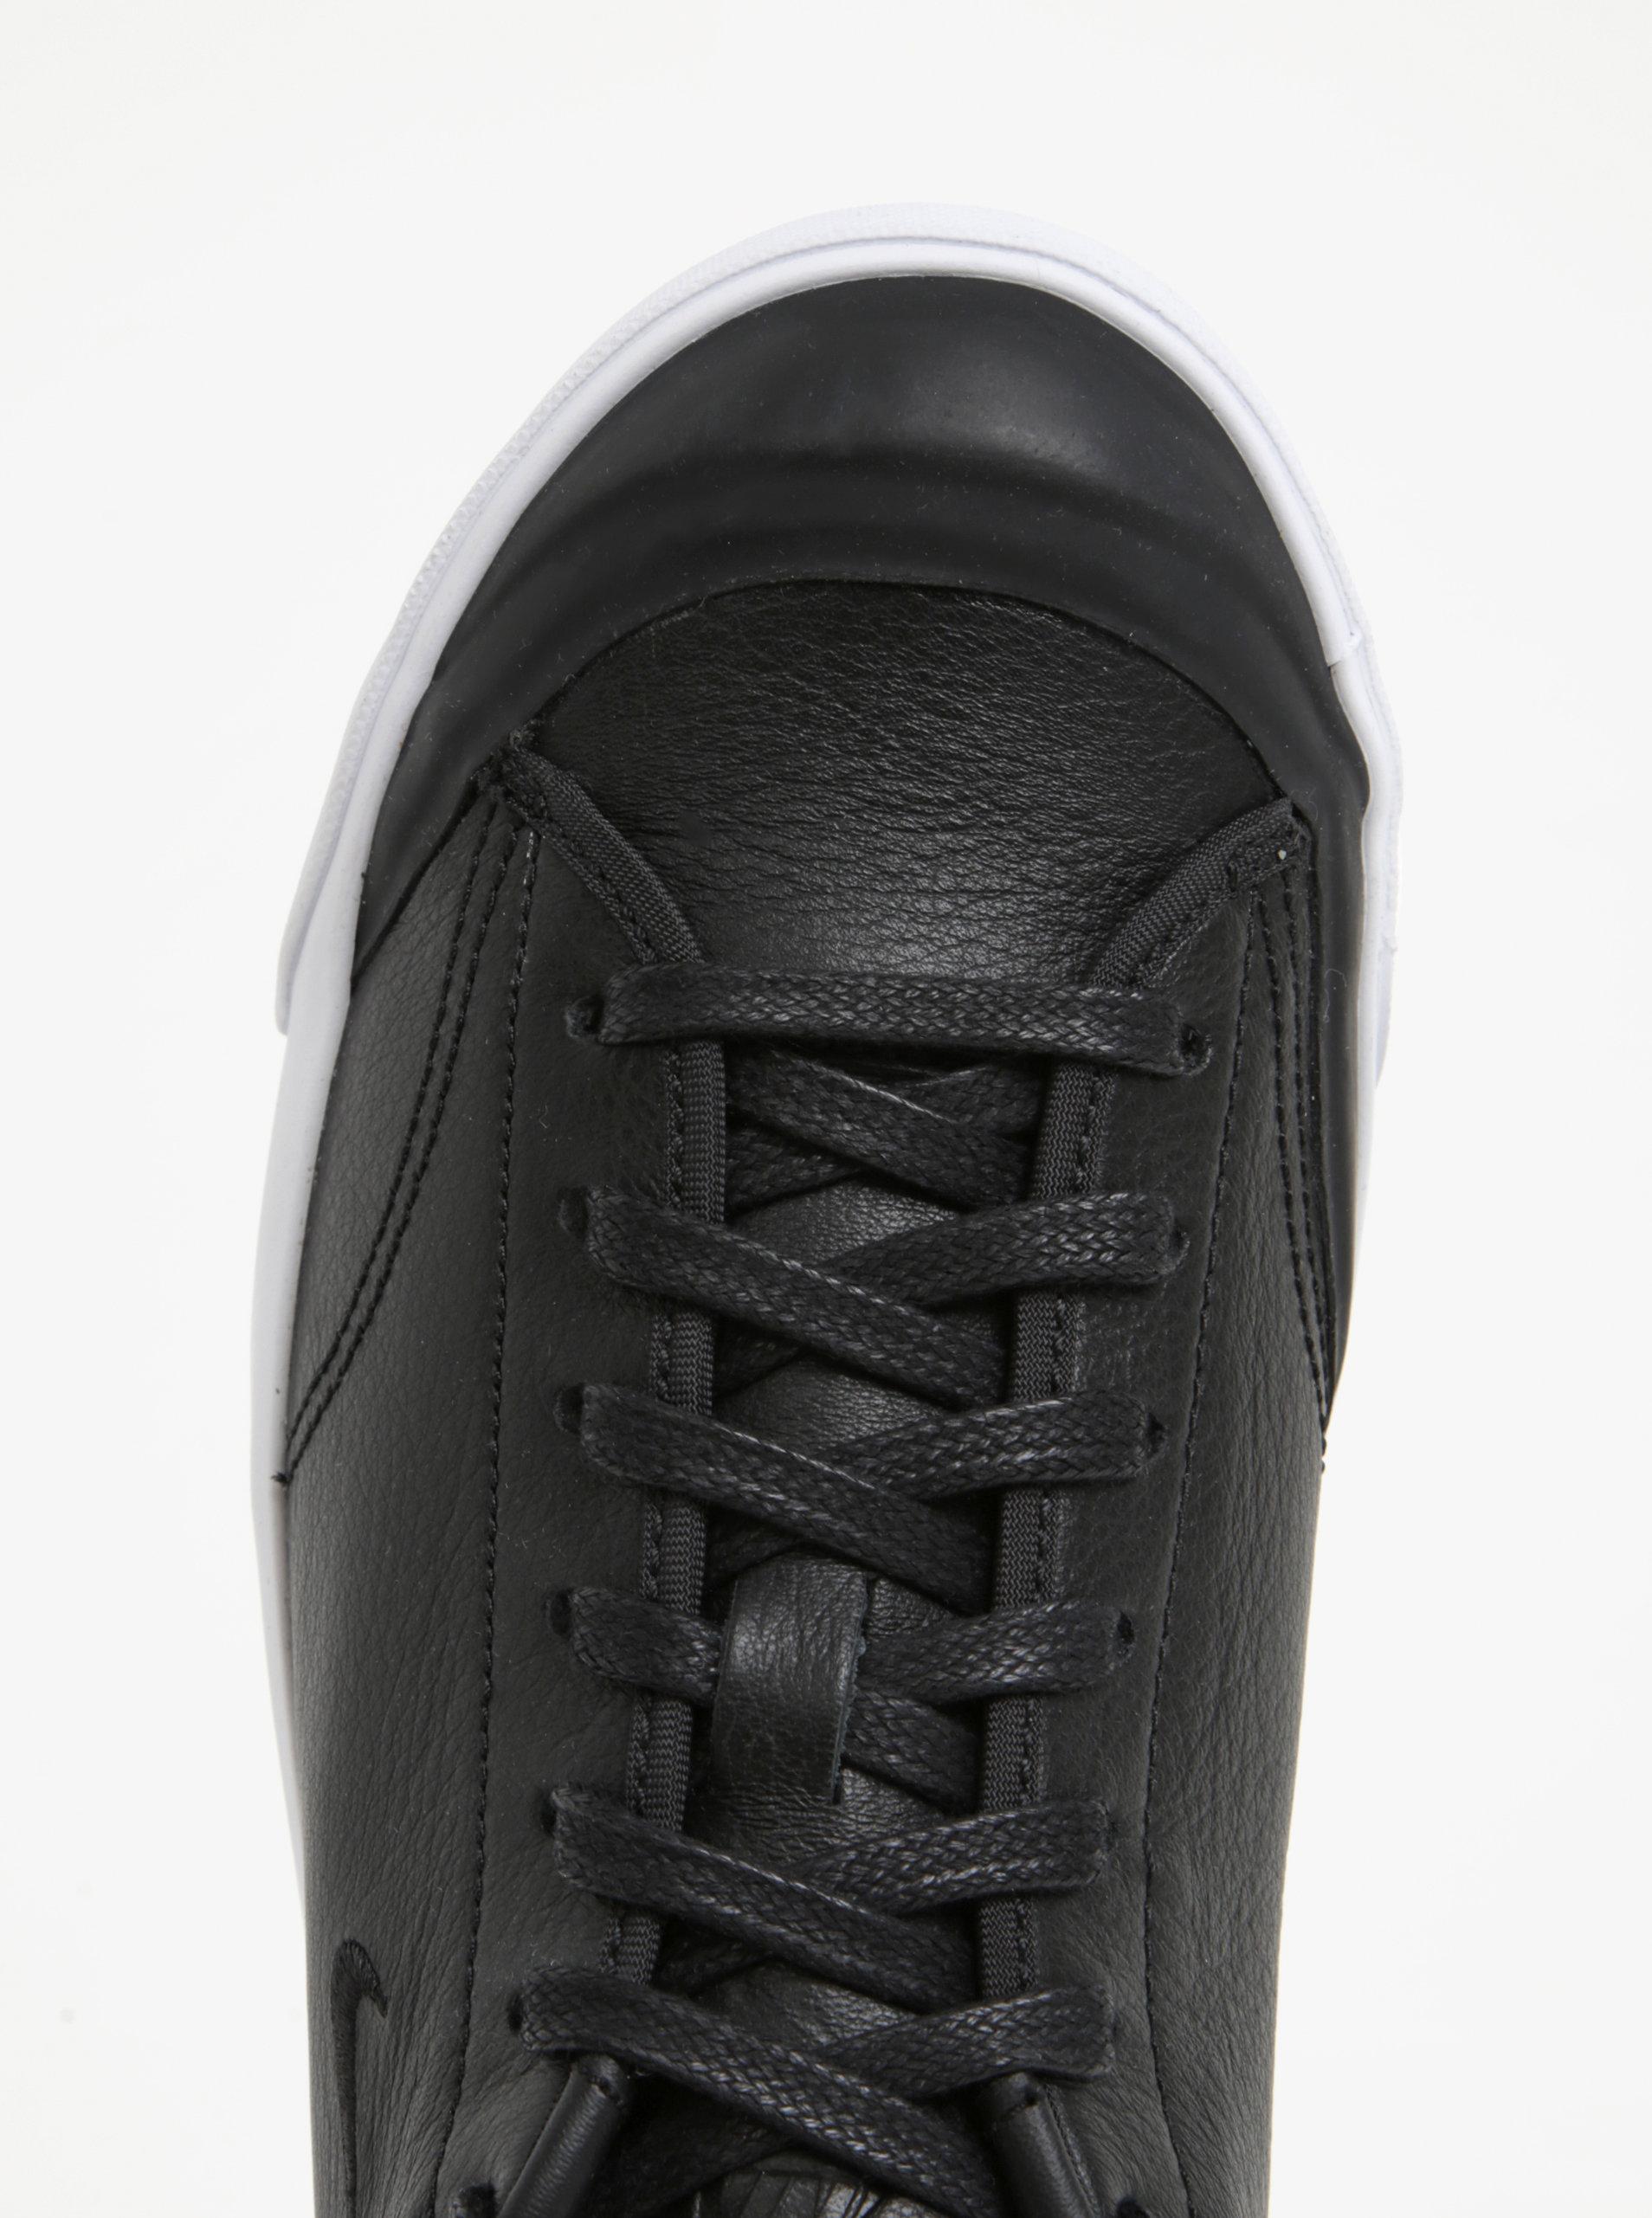 418af0ae2c1 Černé pánské kožené tenisky Nike All Court 2 Low ...